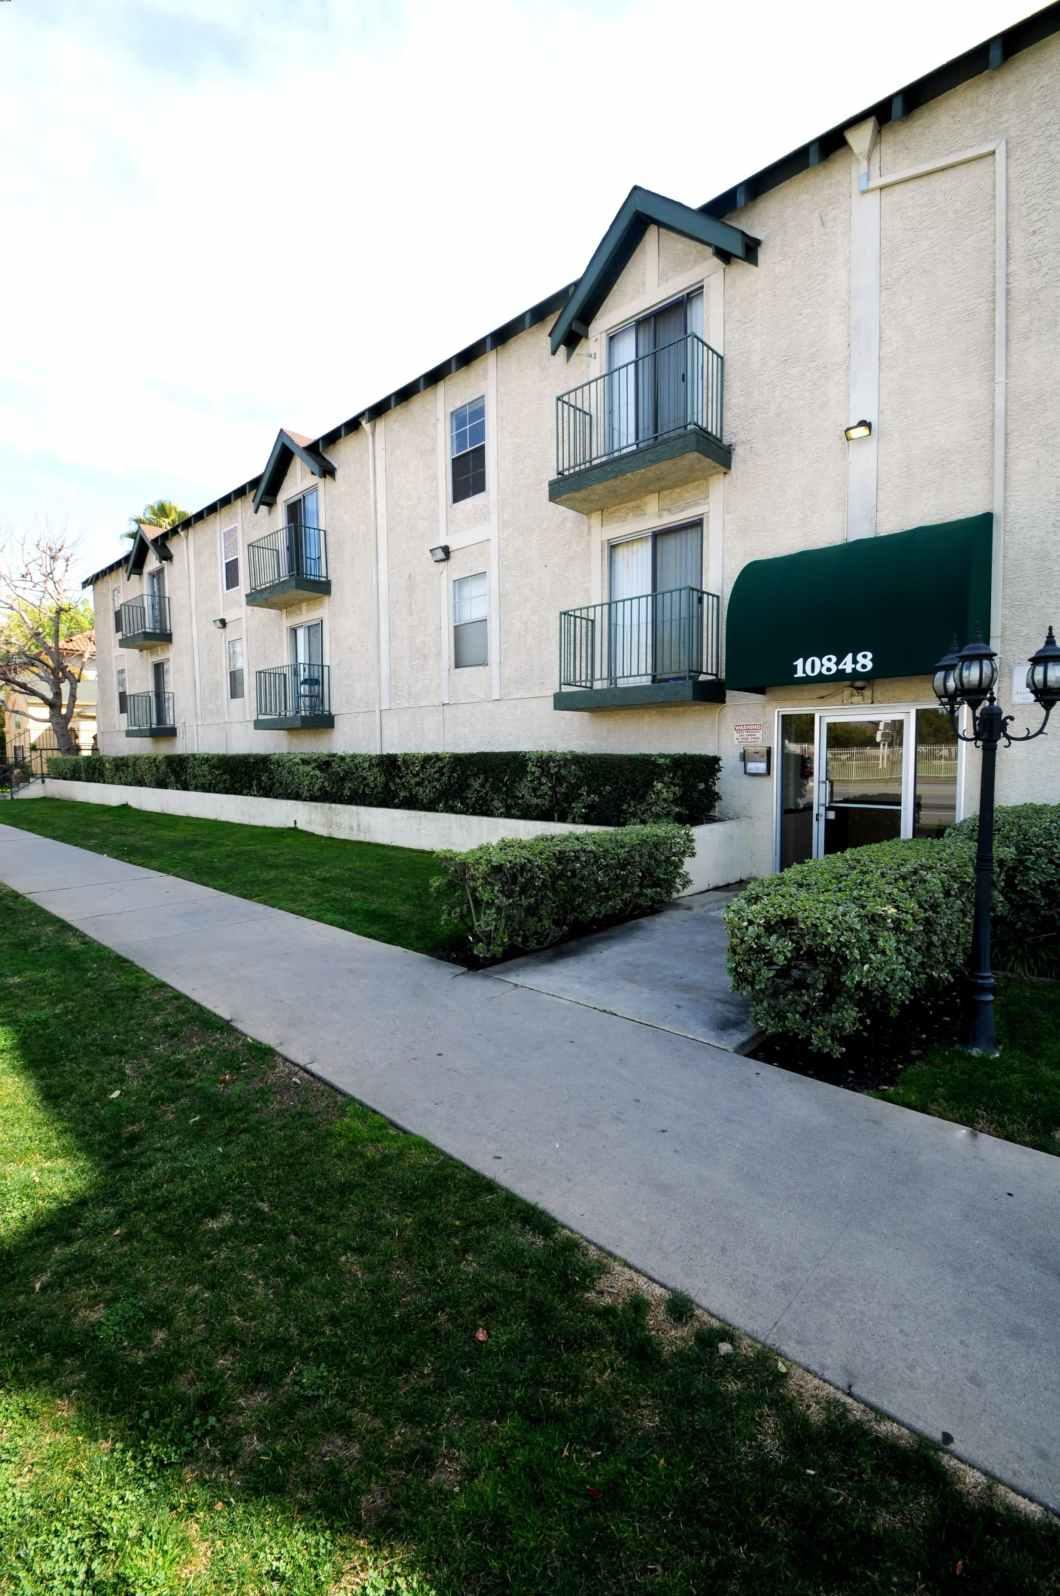 2 Bedroom 2 Bathroom Apartments In North Hollywood